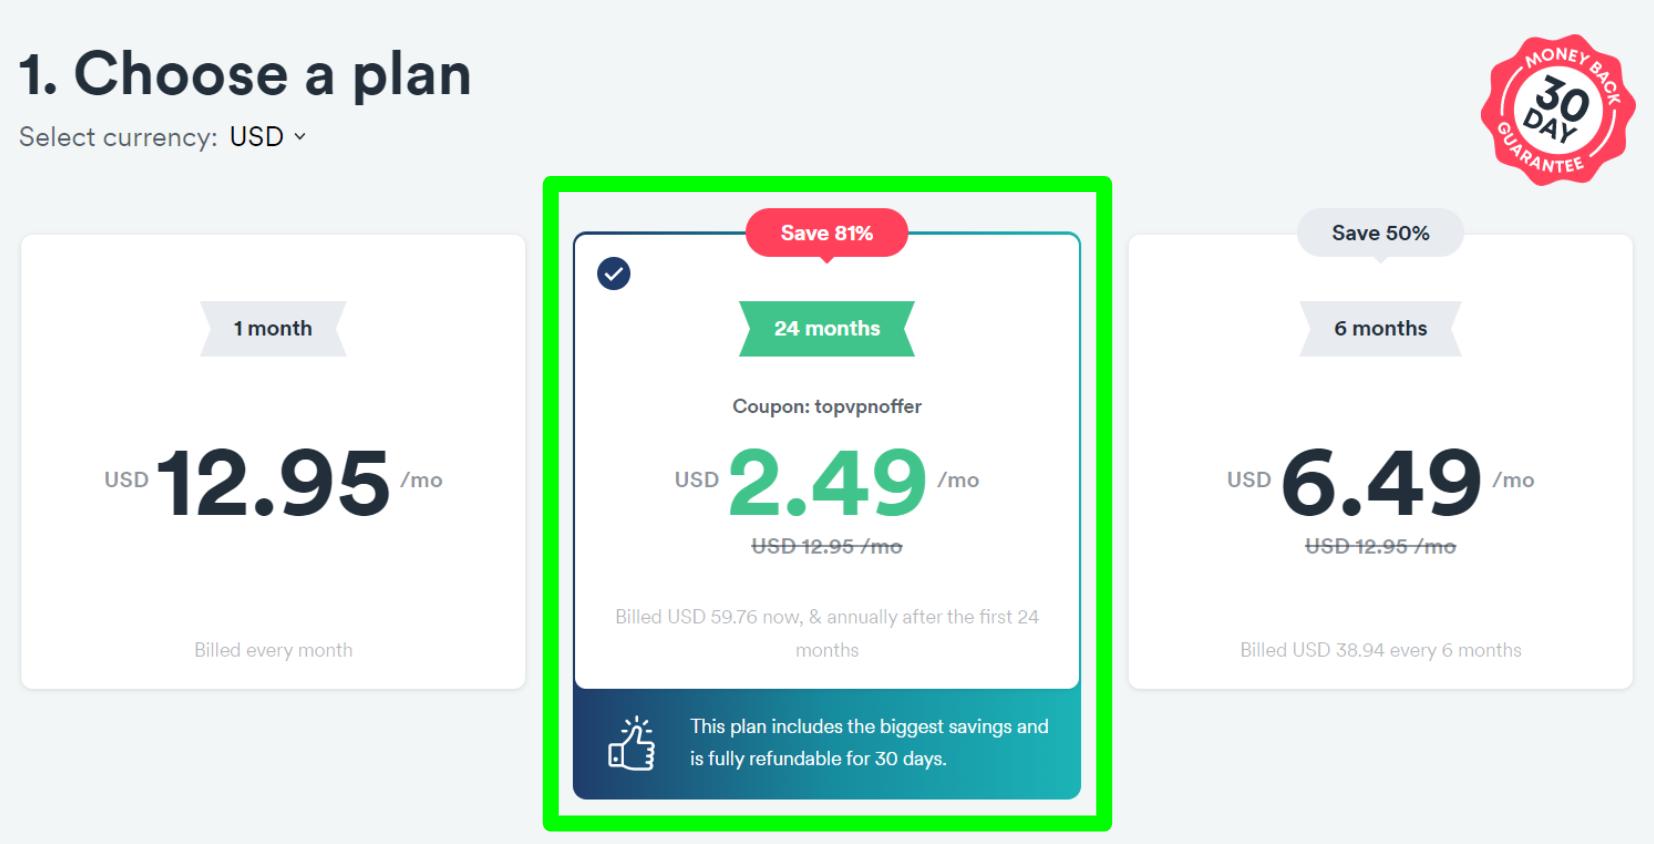 Surfshark定价表的屏幕截图显示了最佳交易的81%折扣